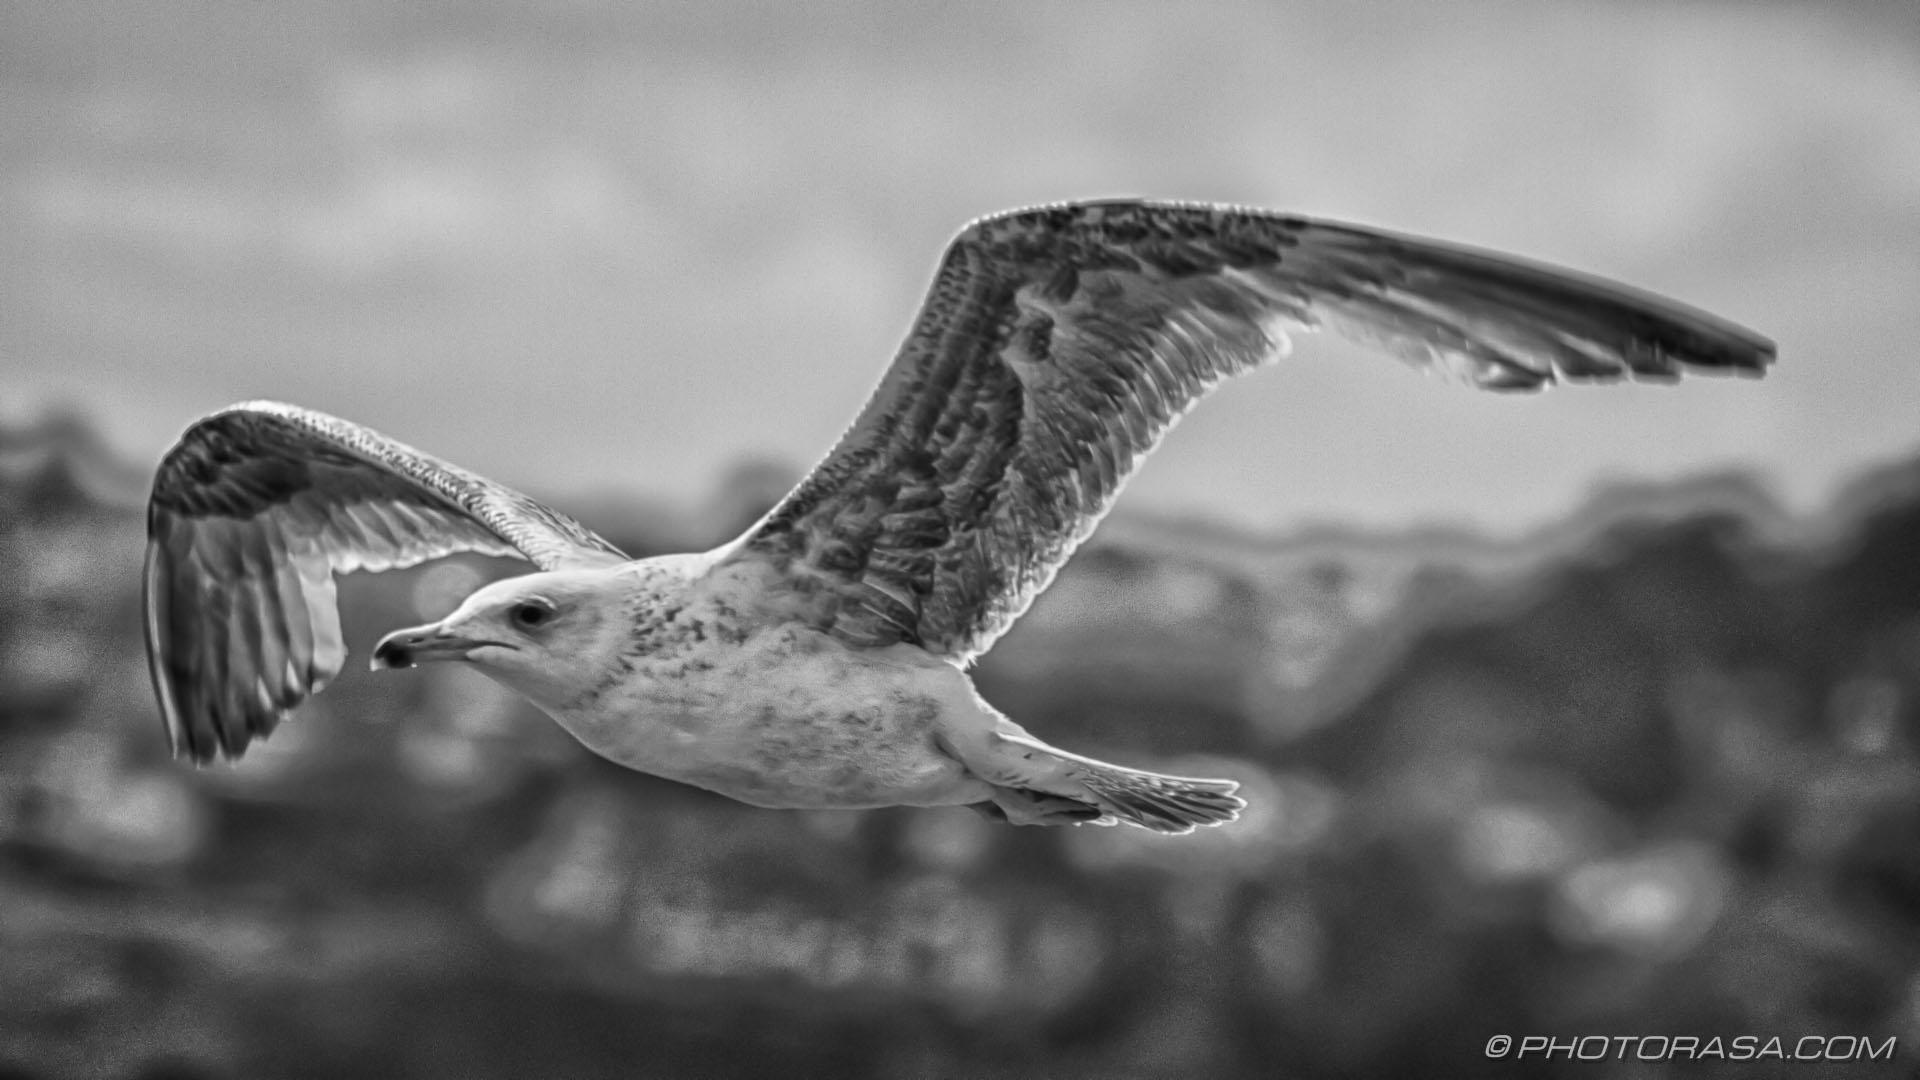 https://photorasa.com/seagulls/dark-bird/